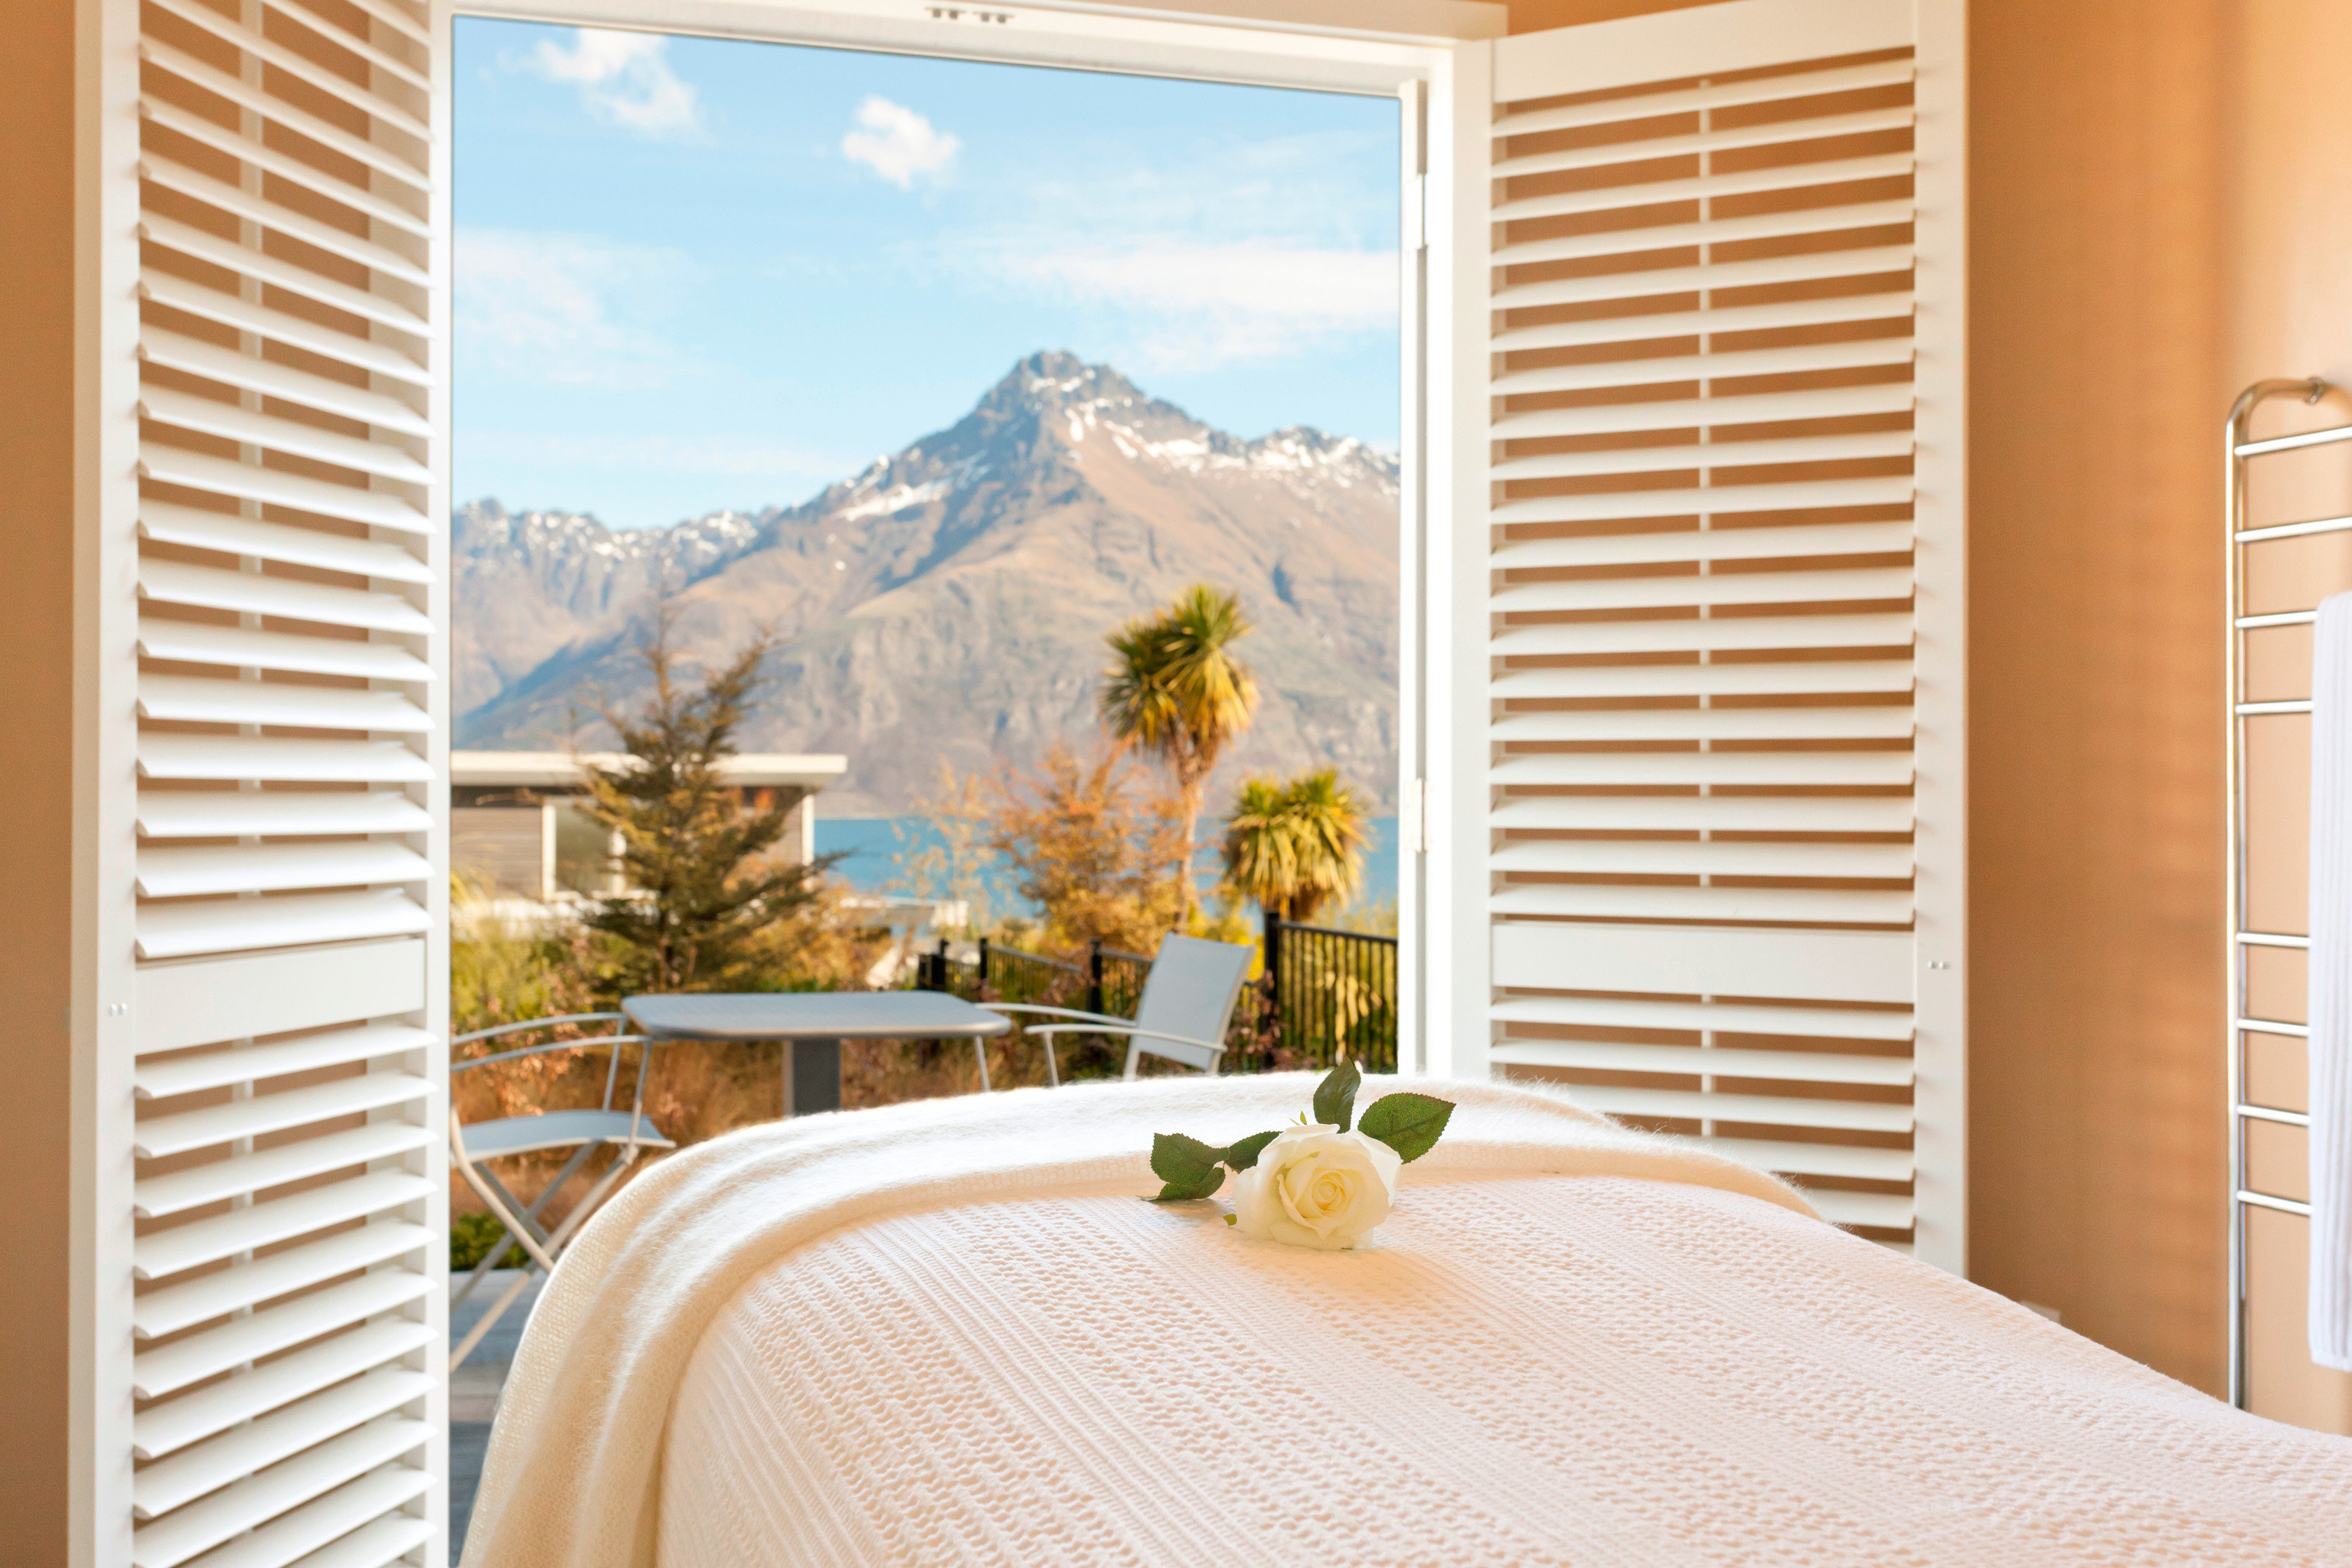 property Bedroom home white window treatment window blind